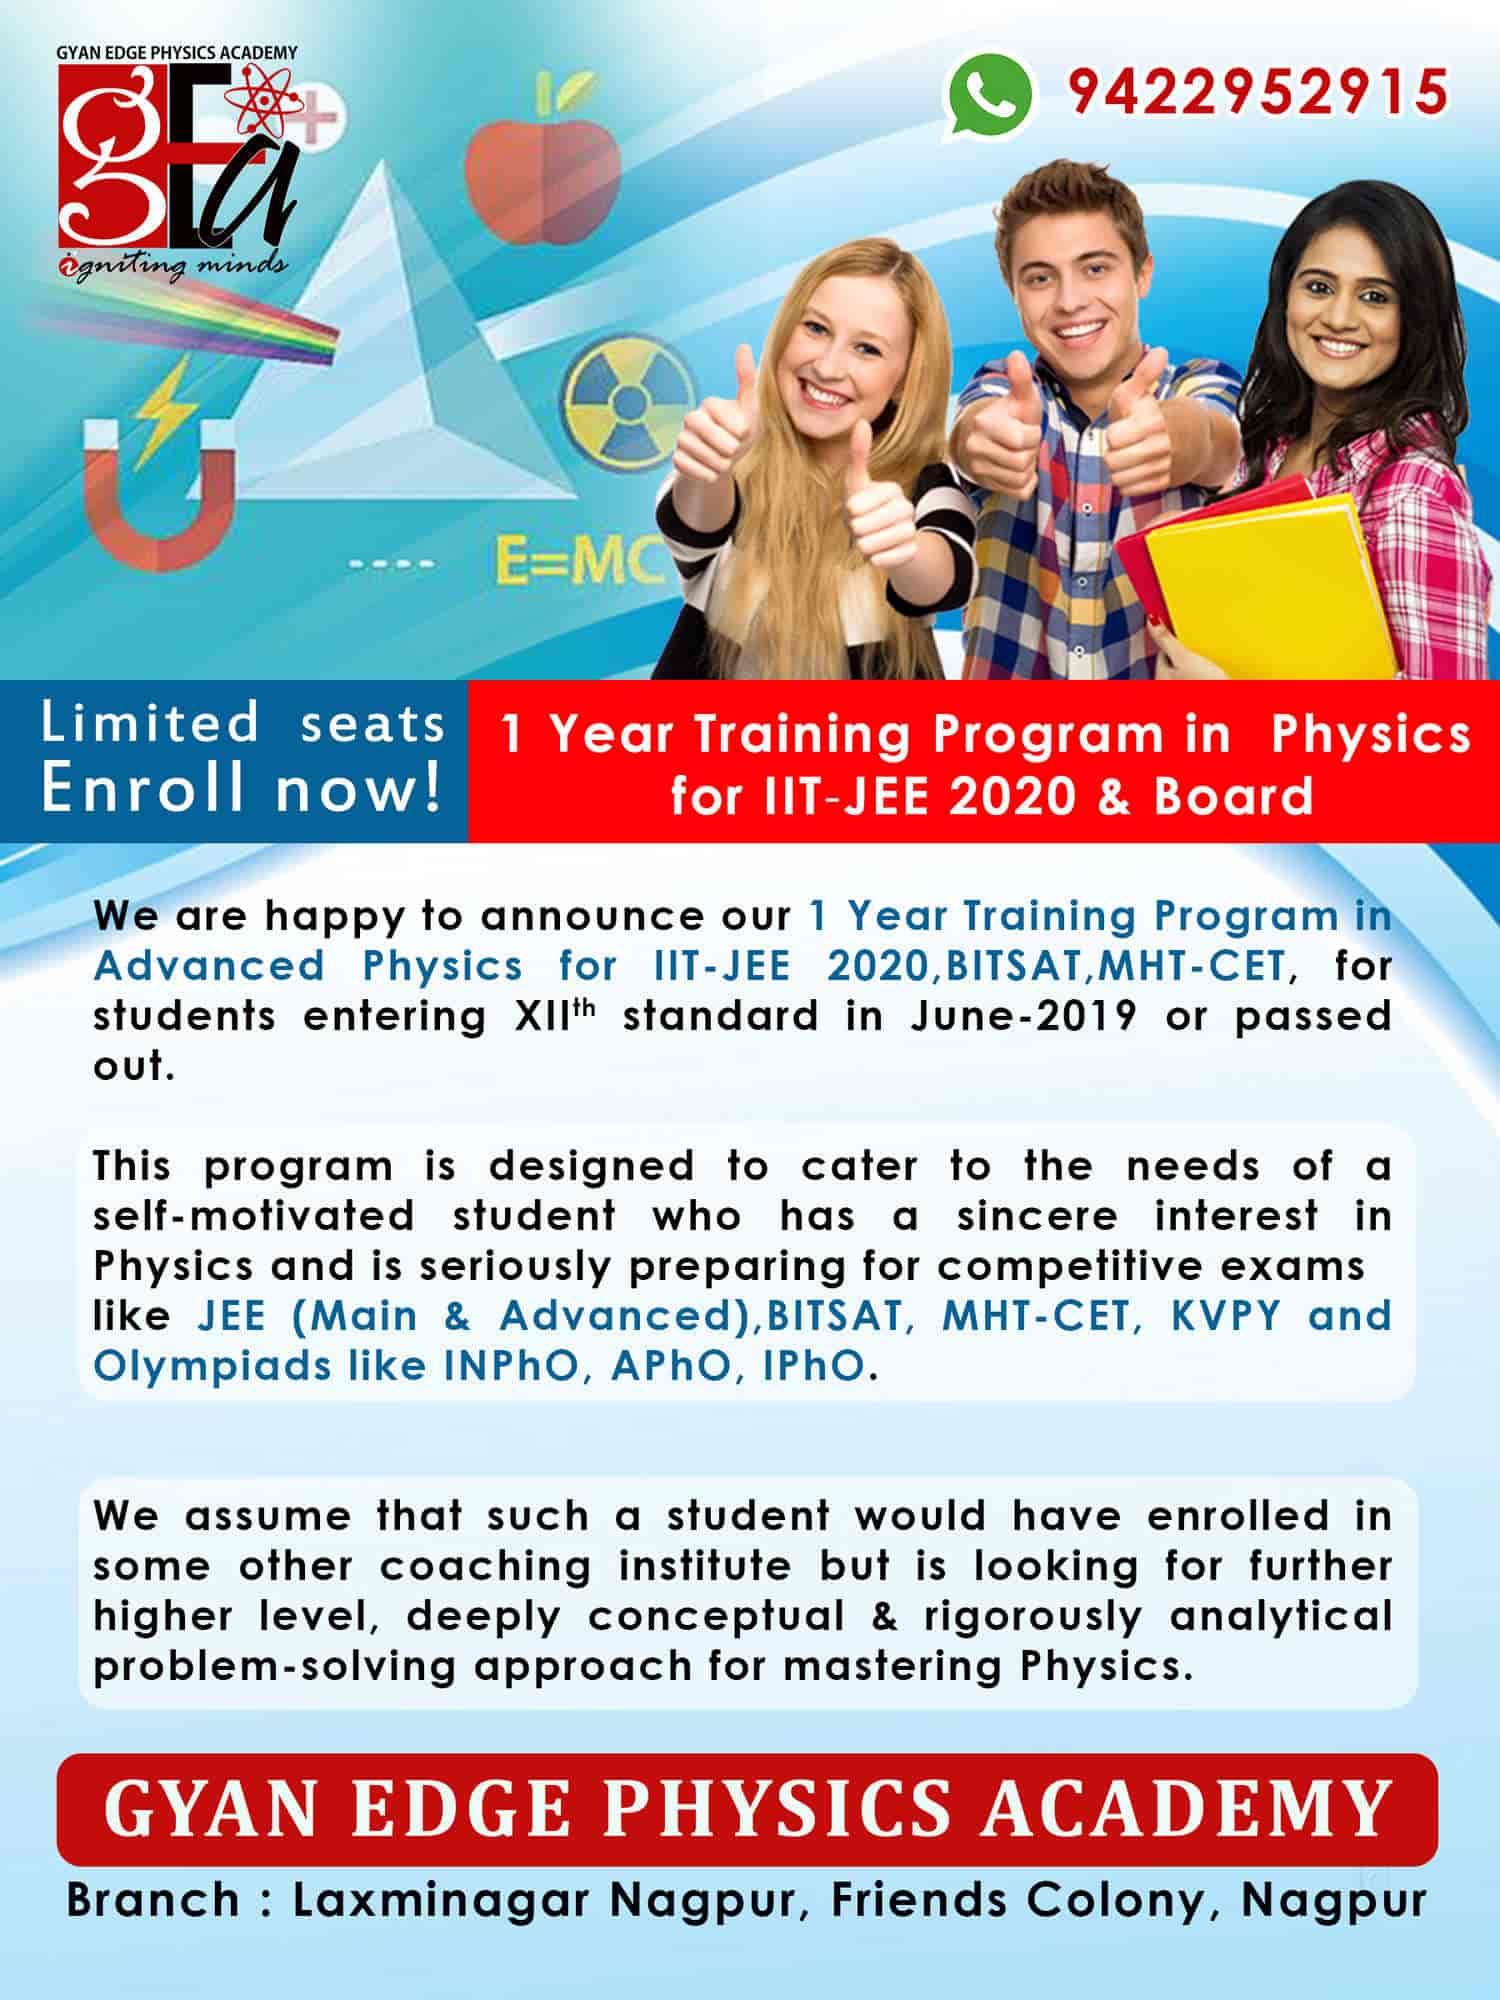 Gyan Edge Physics Academy Photos, Laxmi Nagar, Nagpur- Pictures